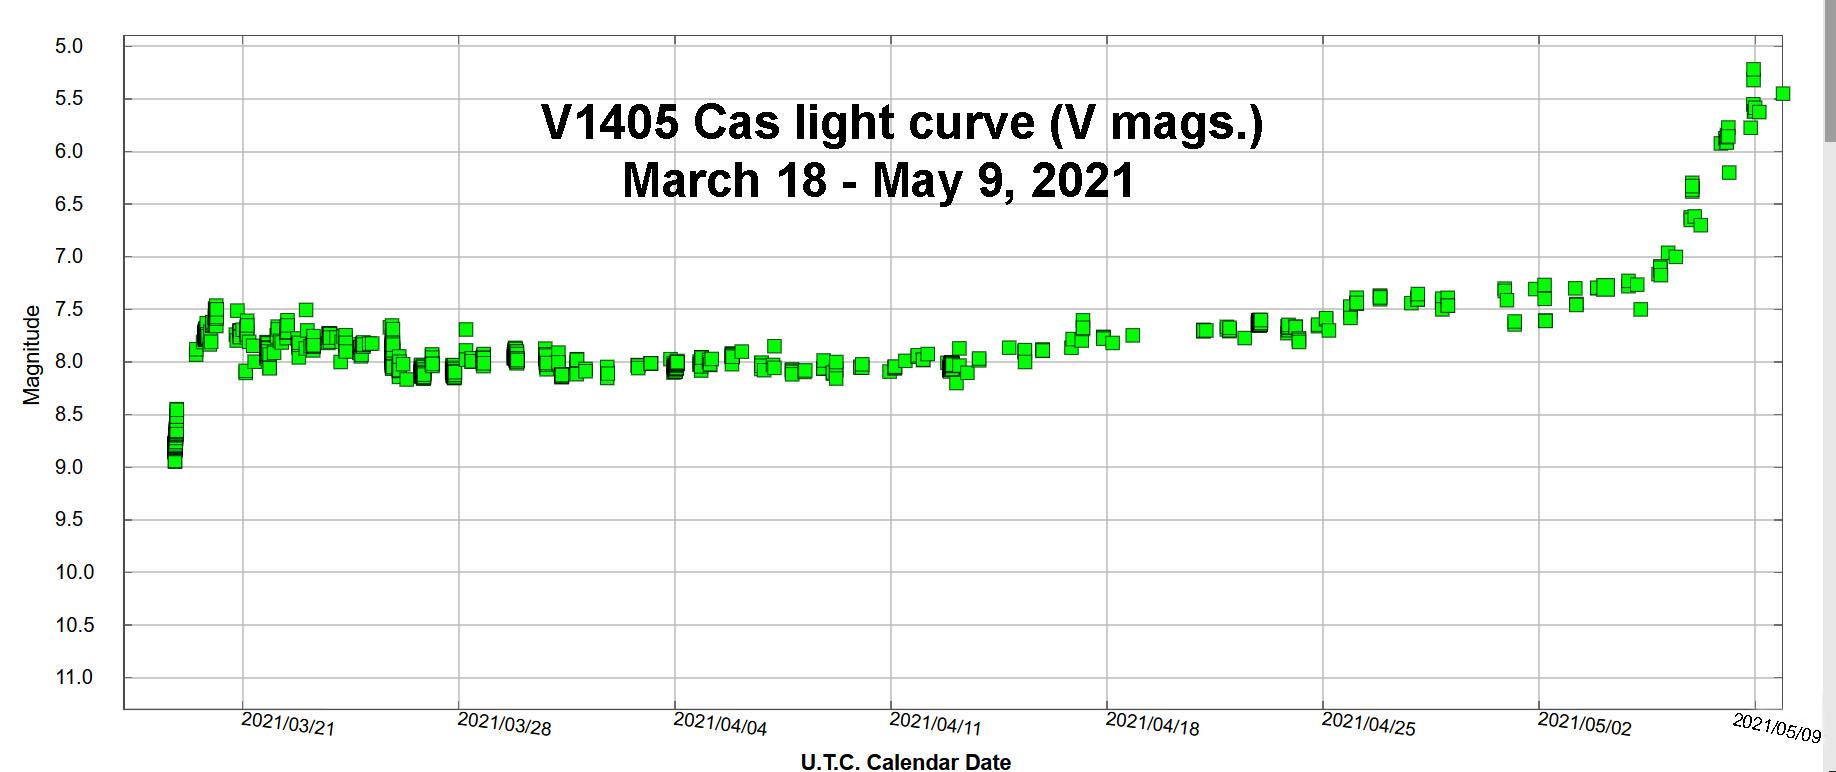 V1405-Cas-light-curve-through-mid-May-20